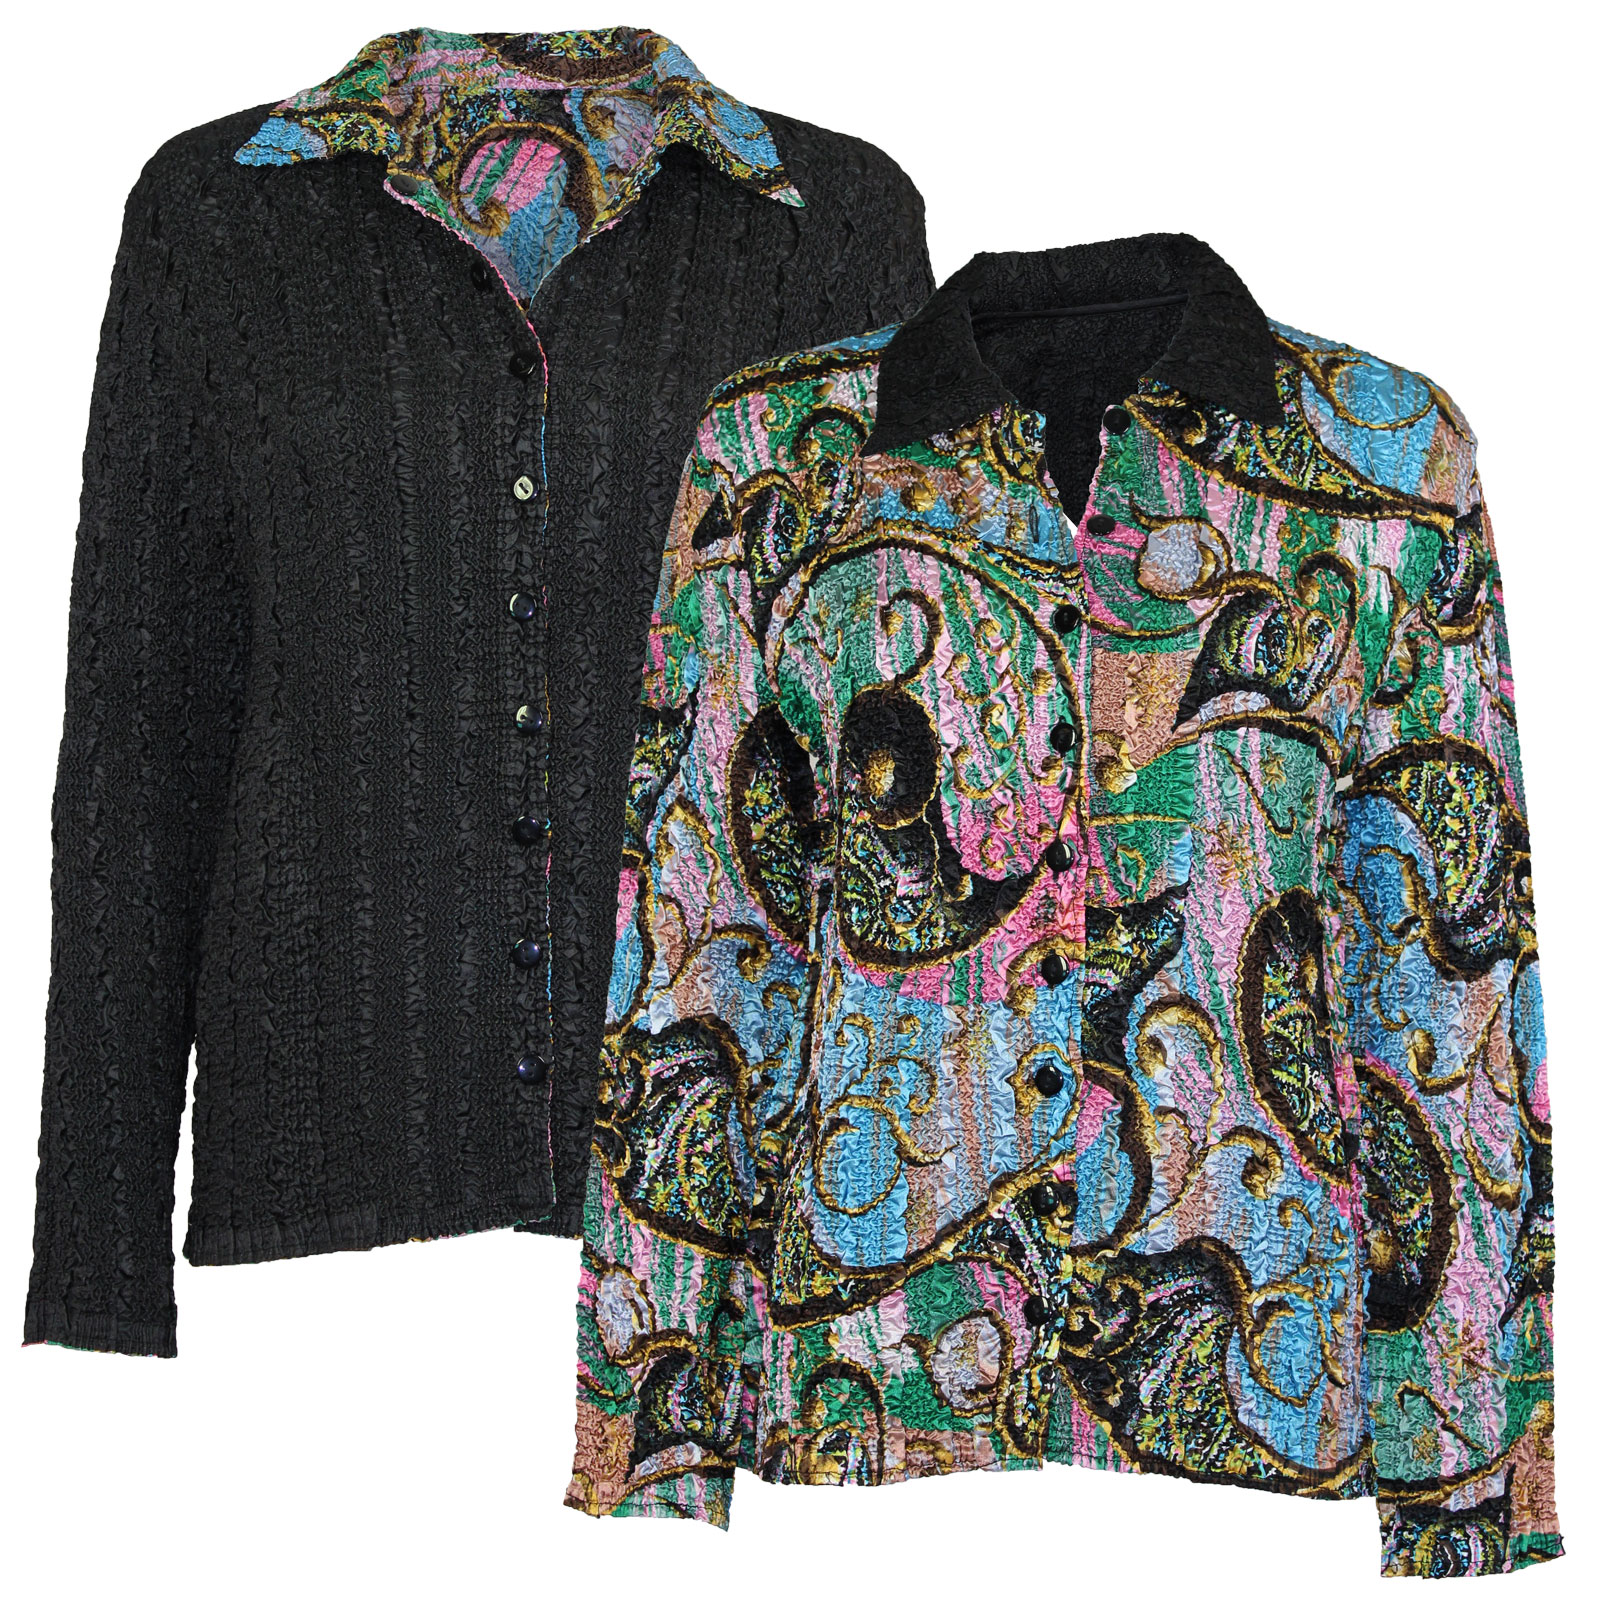 Wholesale Magic Crush - Reversible Jackets #14016 - 1X-2X